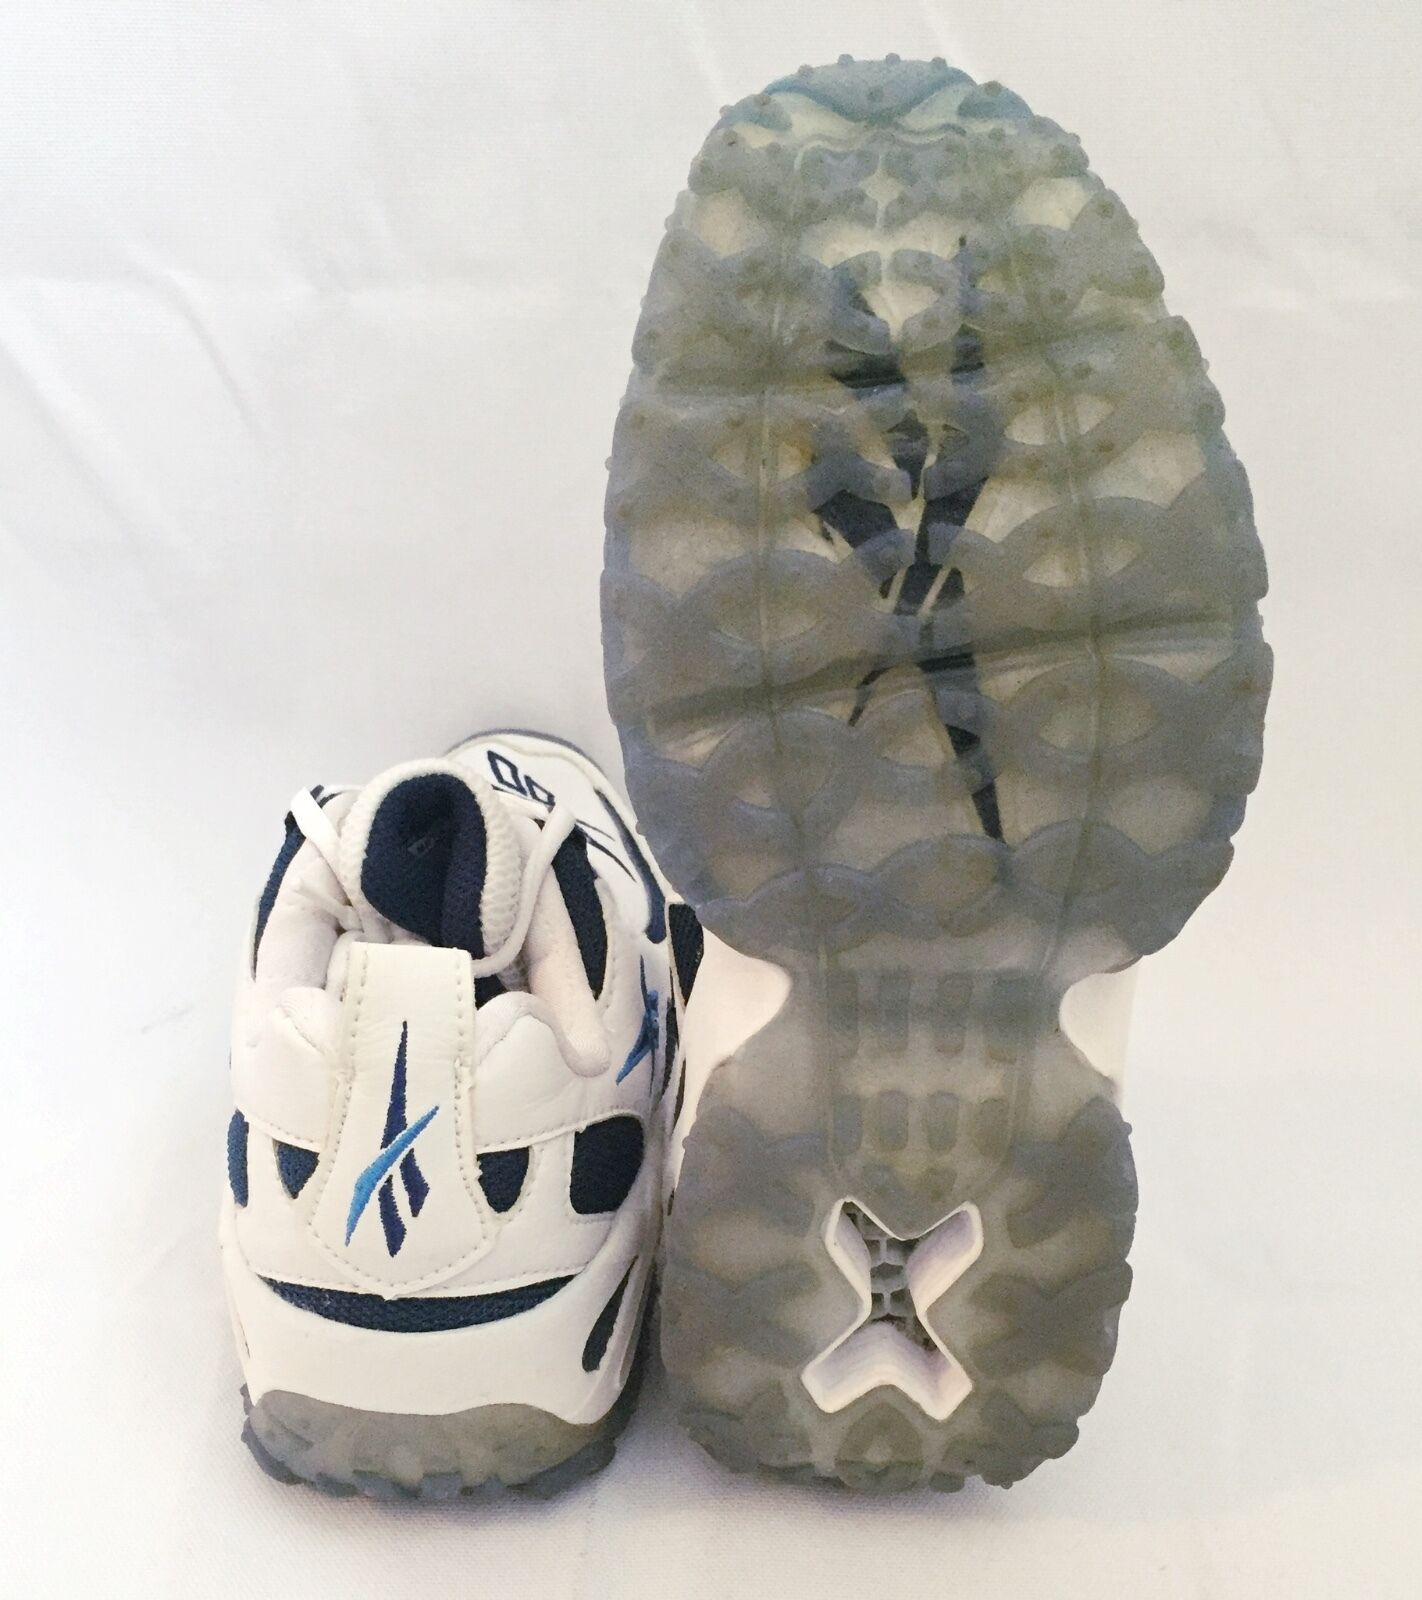 Vintage reebok reebok reebok scarpe da ginnastica mantra donna Dimensione 5.5 deadstock NIB 1993 14b309